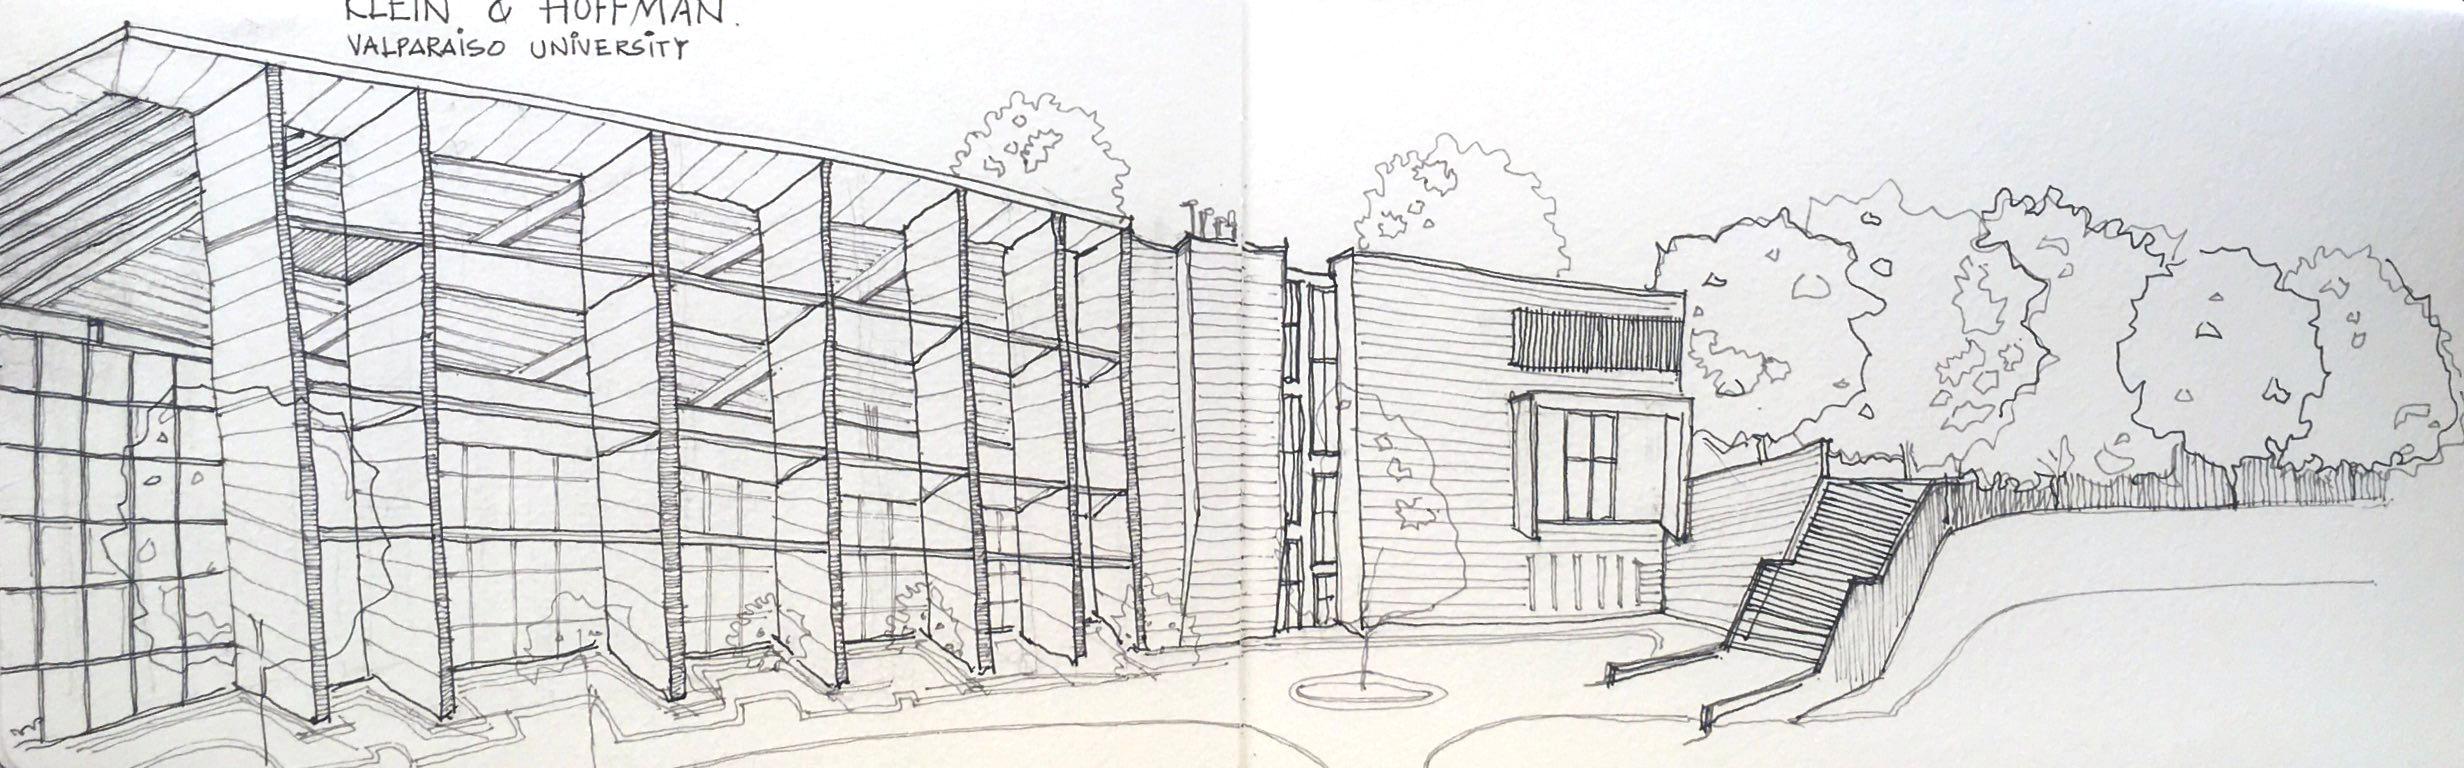 Klien&Hoffmann sketch_Hiral Mangrola